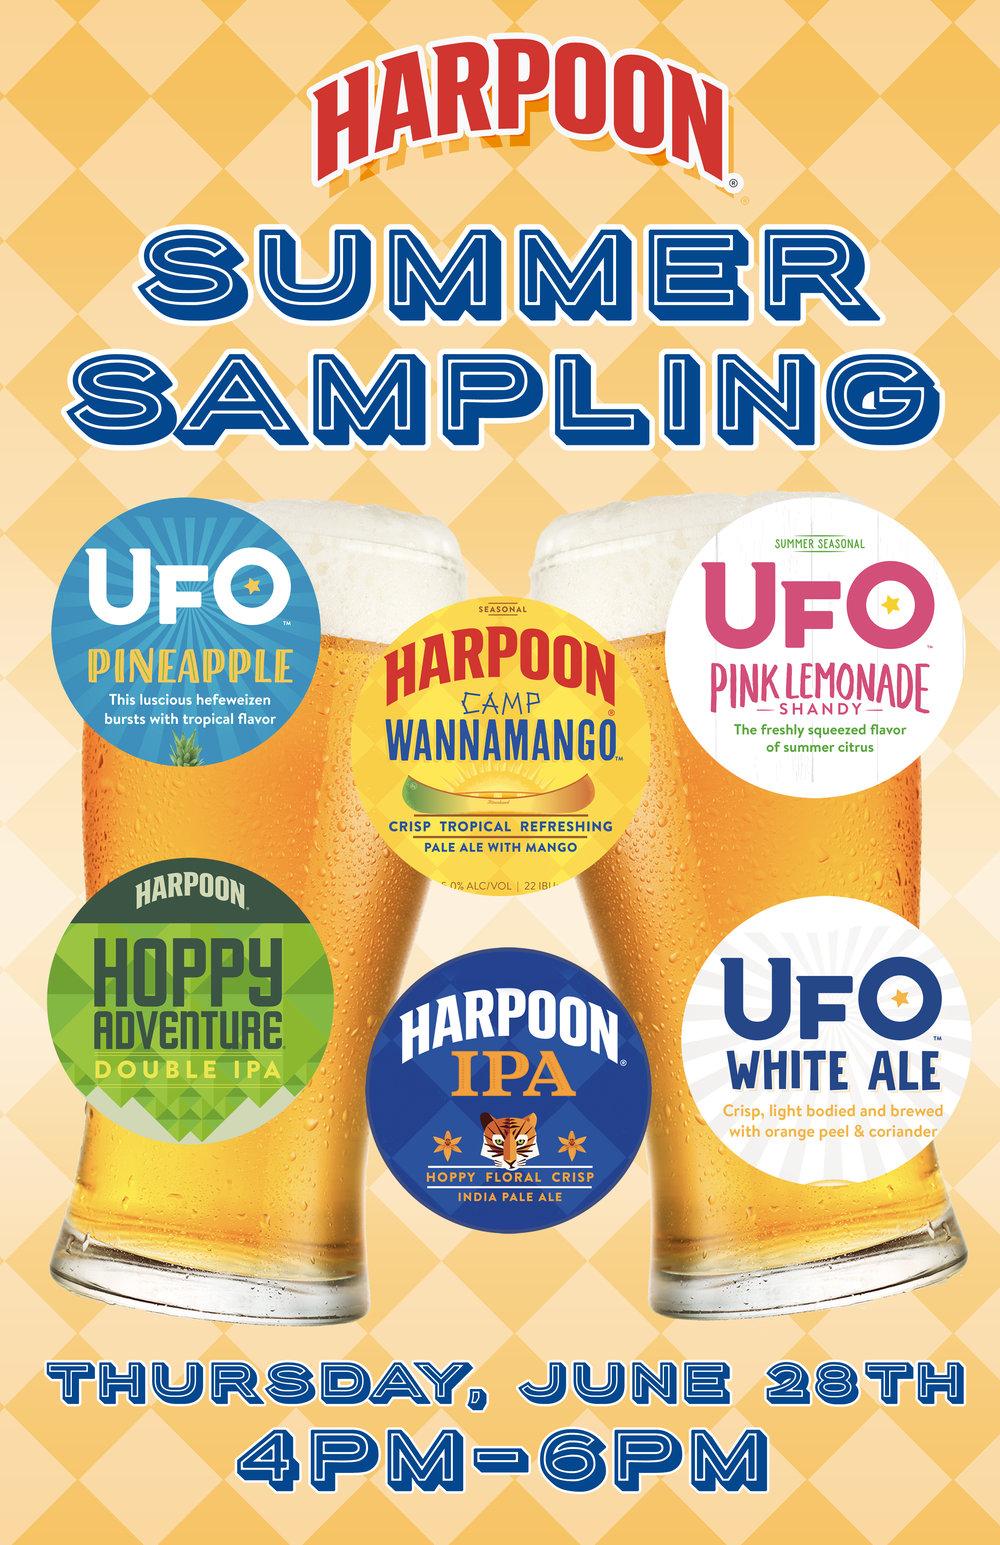 harpoon_summersampling.jpg